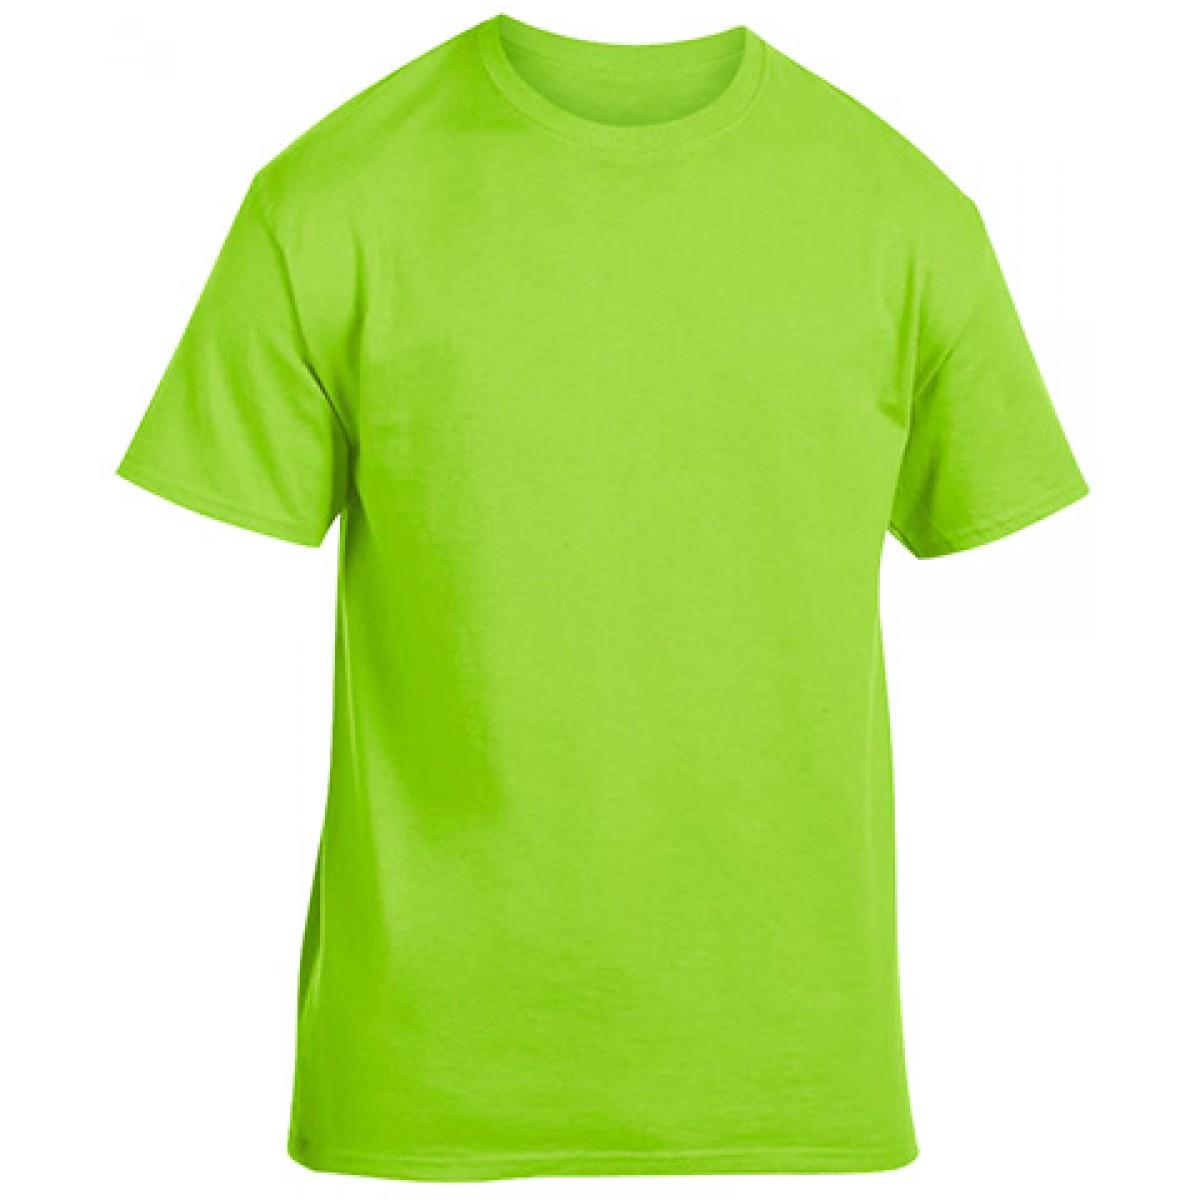 Soft 100% Cotton T-Shirt-Lime Green-L